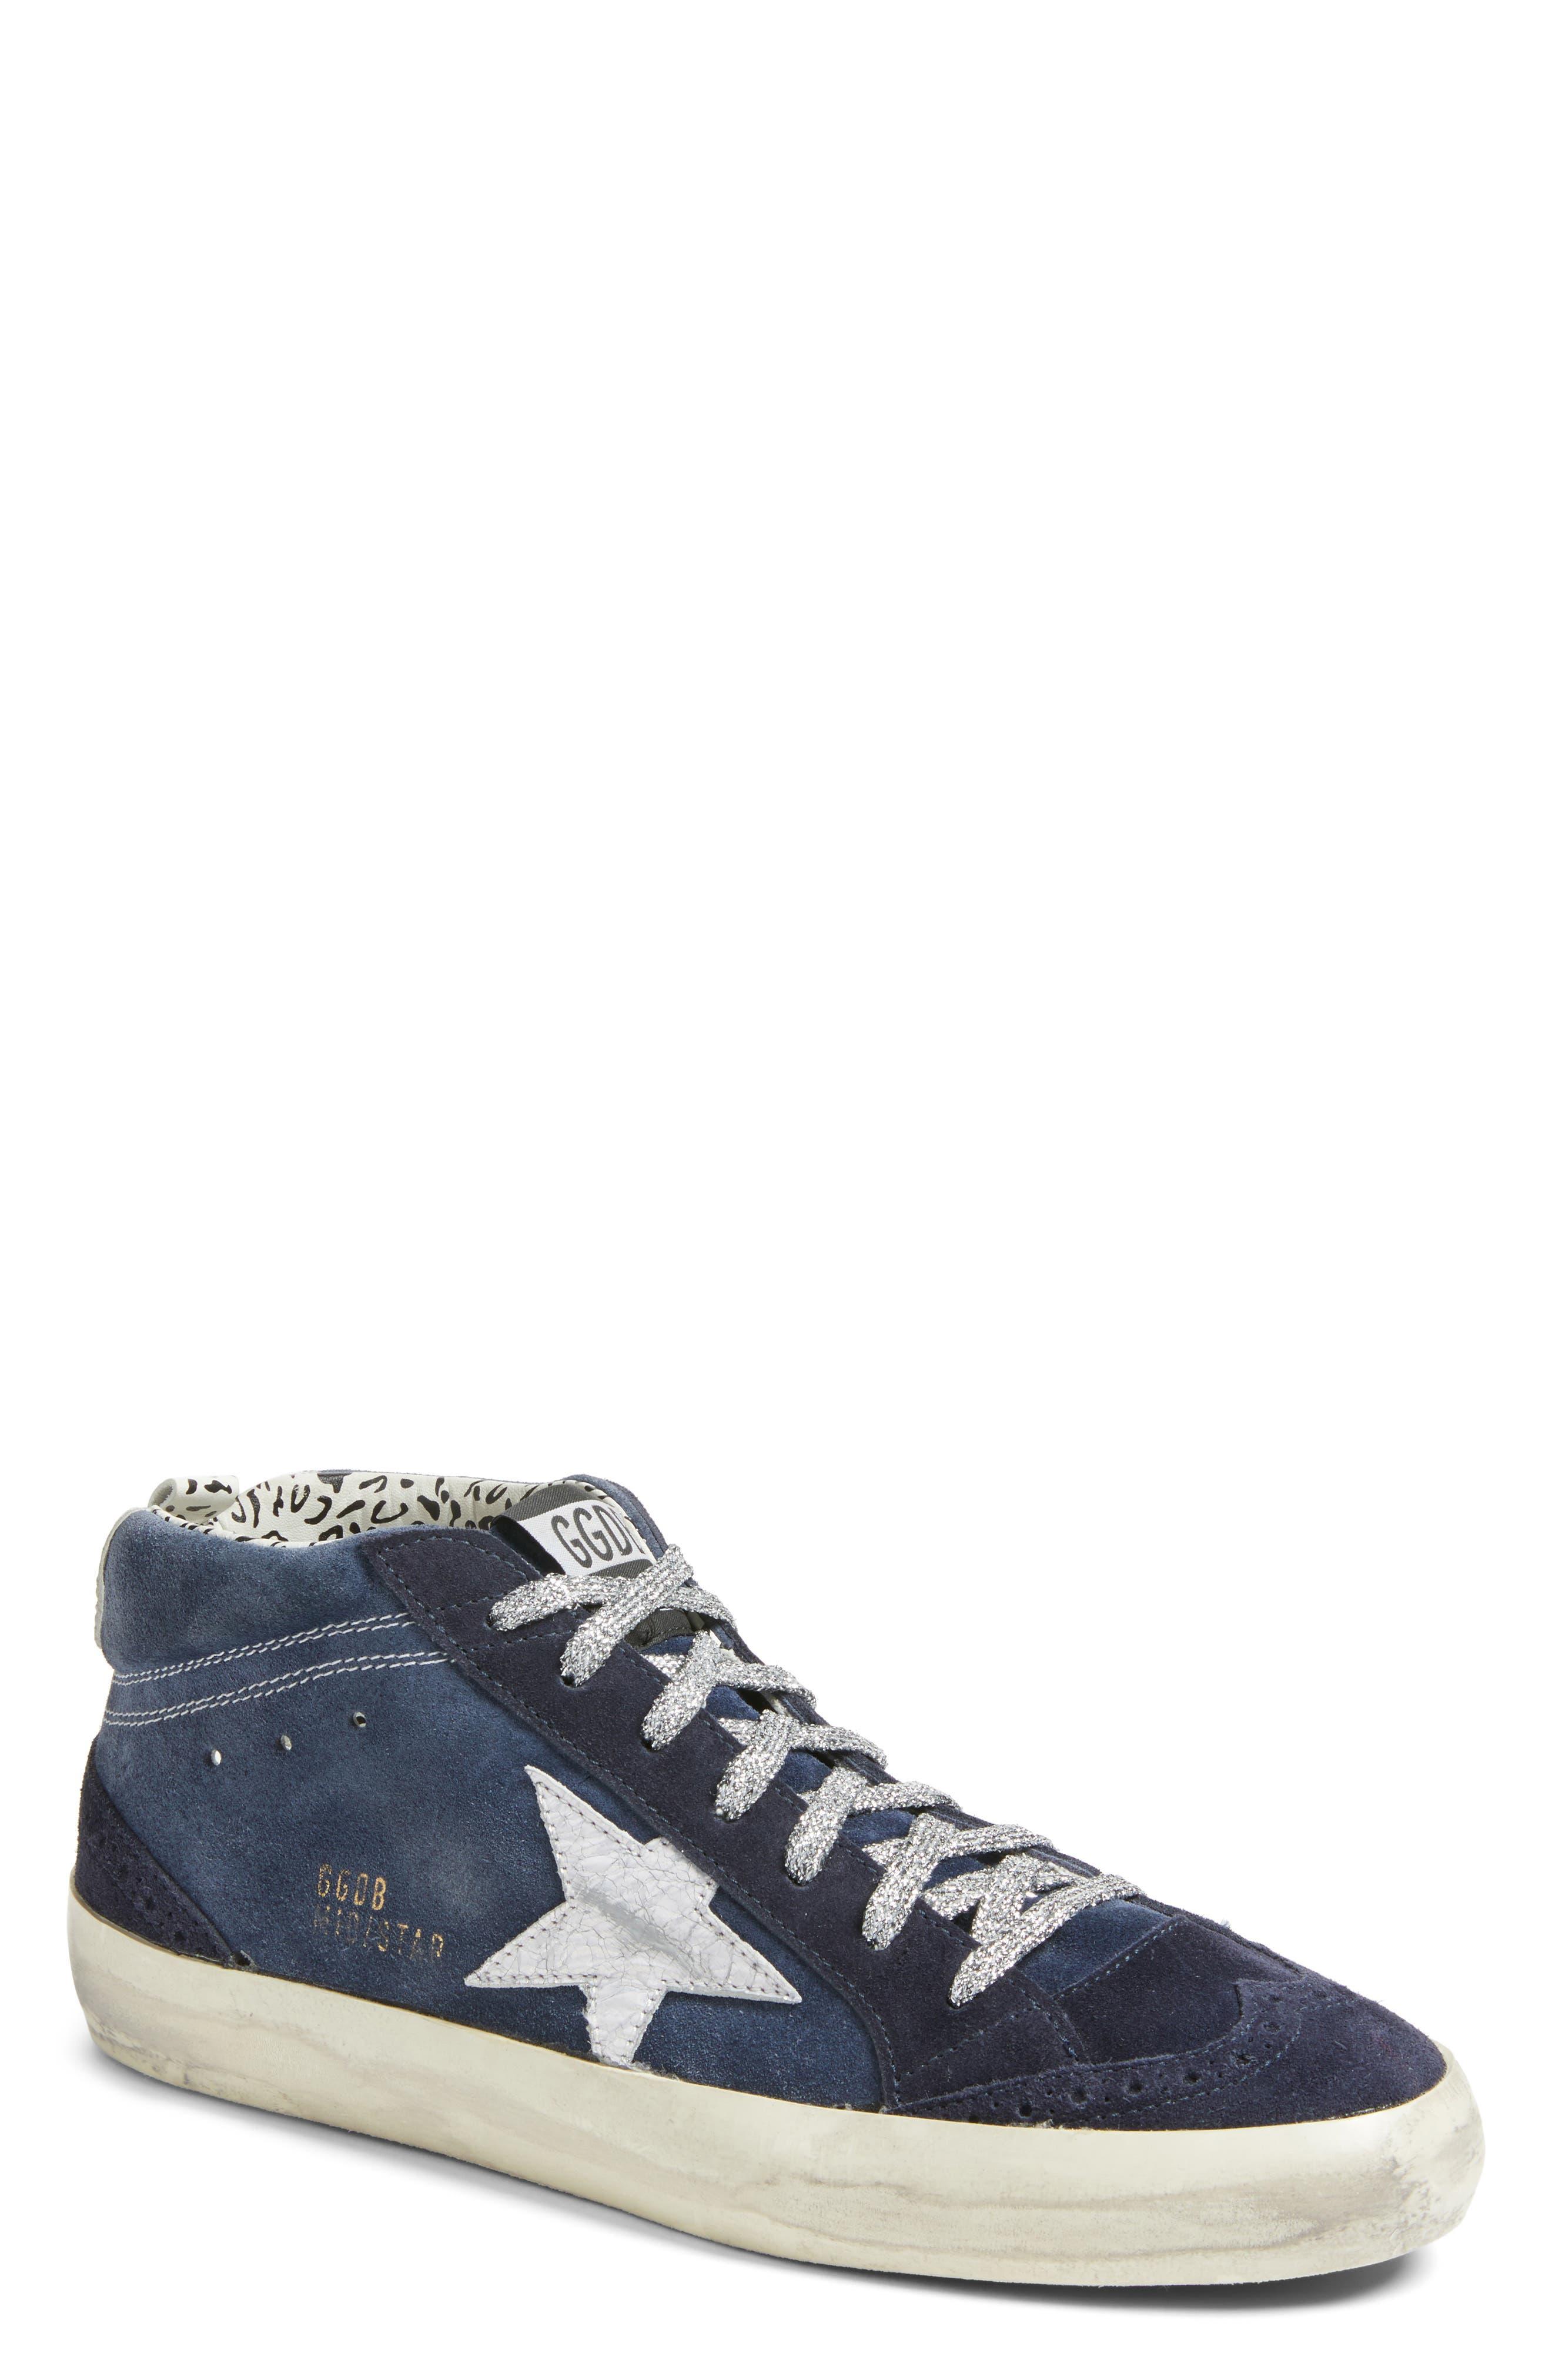 Star Mid Top Sneaker,                             Main thumbnail 1, color,                             401